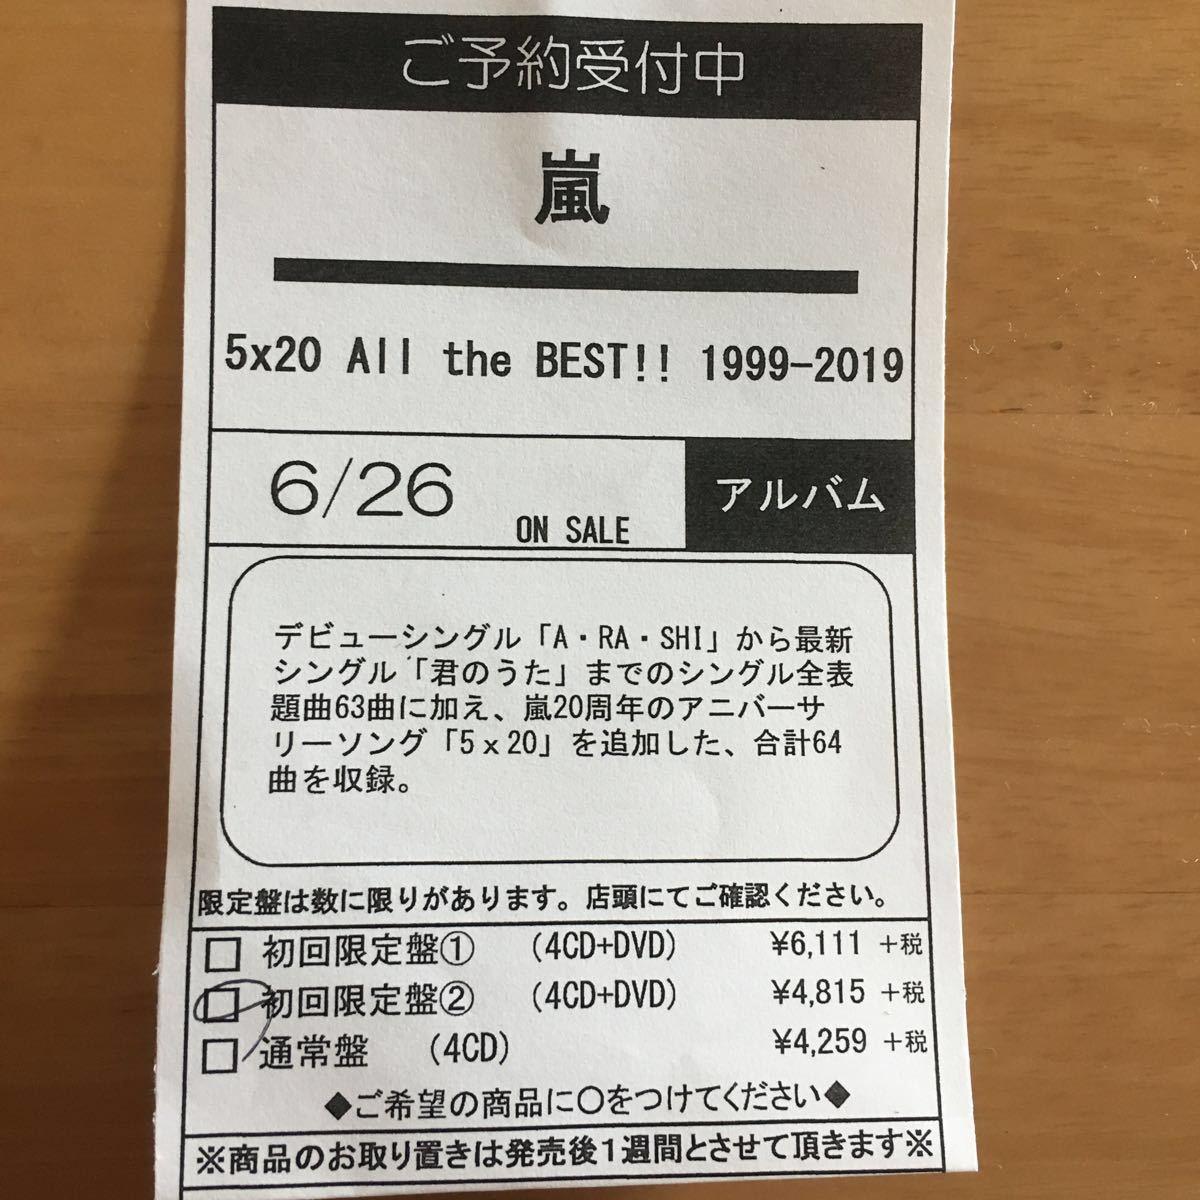 5×20 All the BEST!! 1999-2019 (初回限定盤2) (4CD+1DVD-B) 嵐 予約済み 新品未開封_画像2